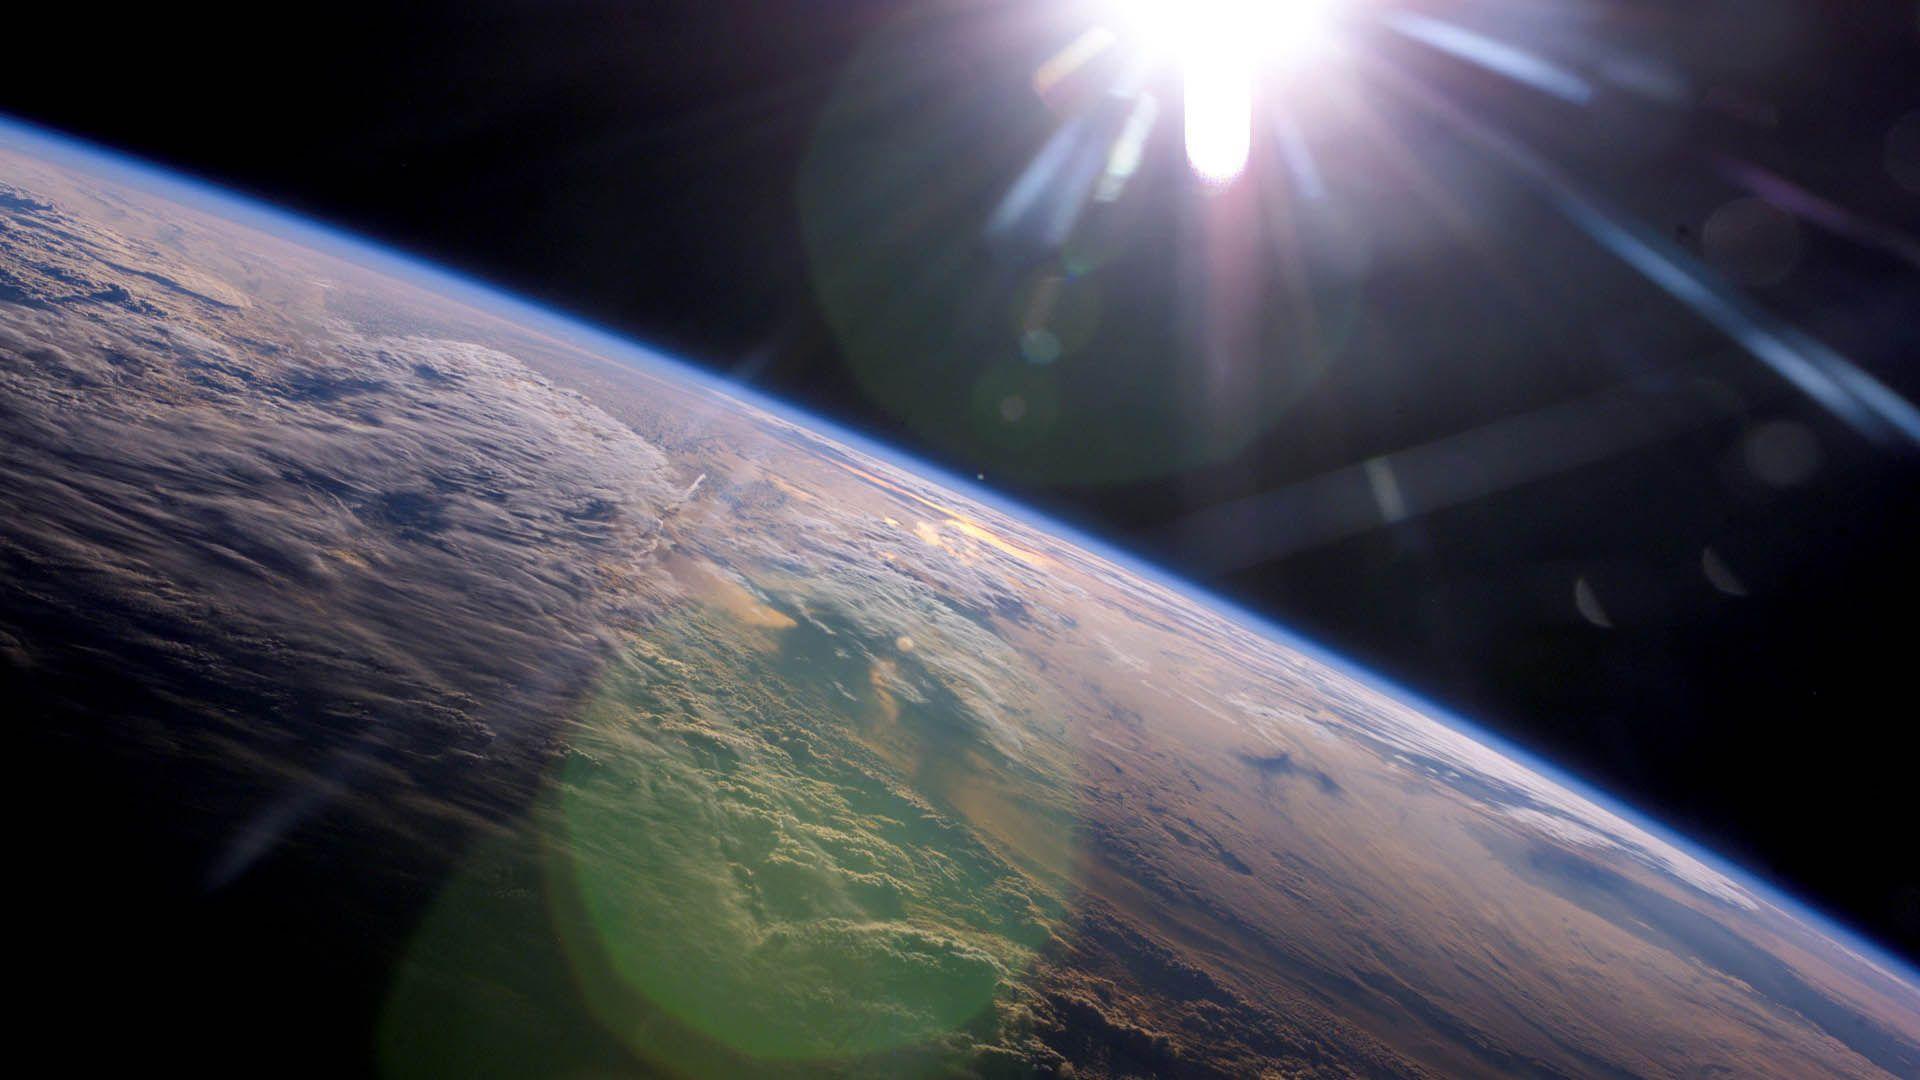 wallpaper spacewalk nasa - photo #31